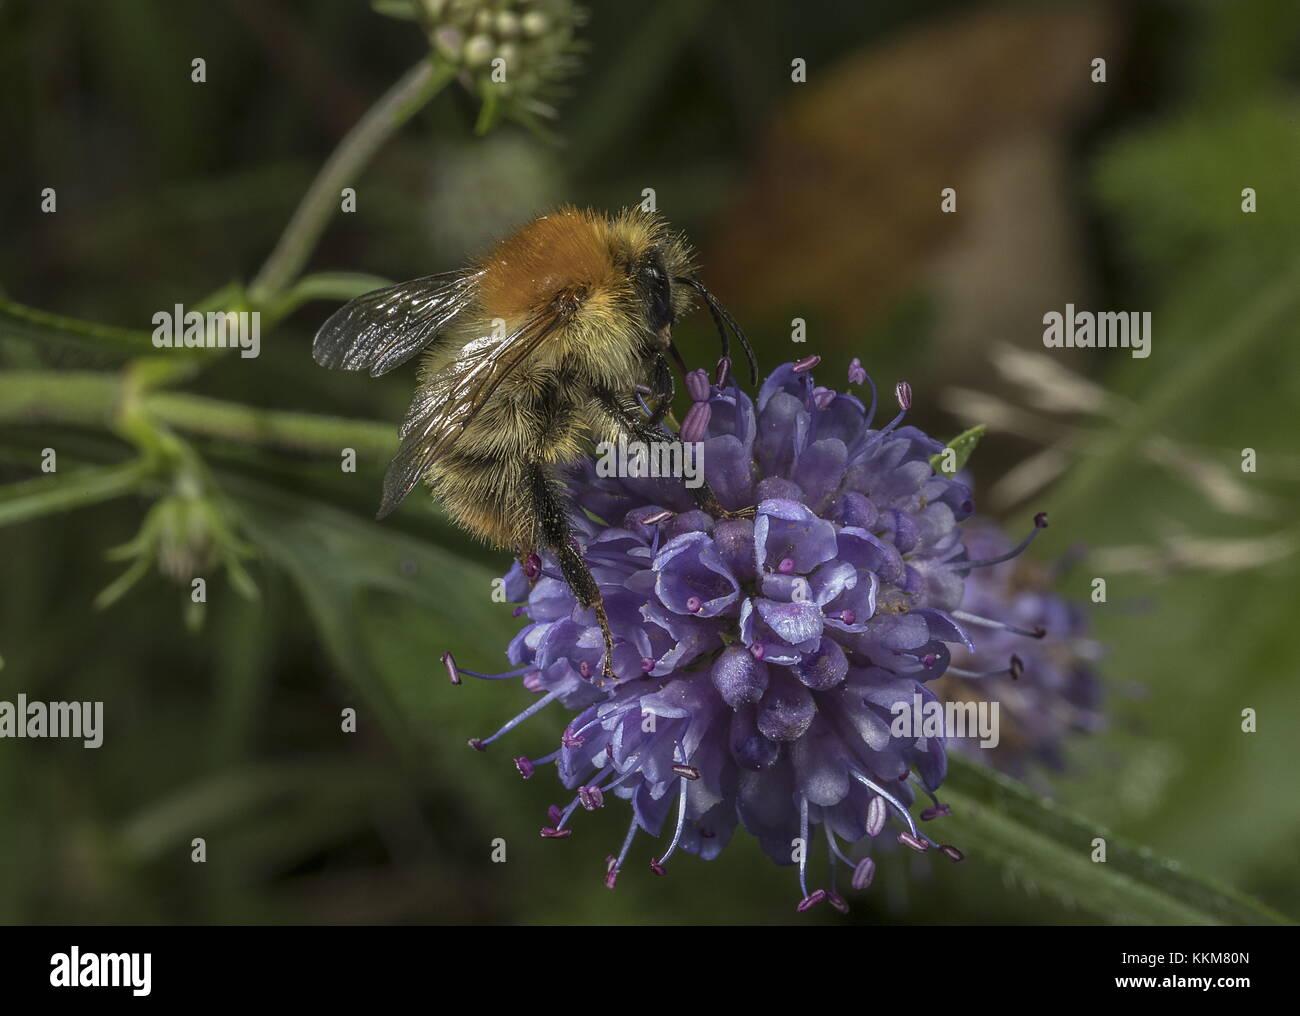 Common Carder Bee, Bombus pascuorum visiting Devil's bit scabious flowers. - Stock Image